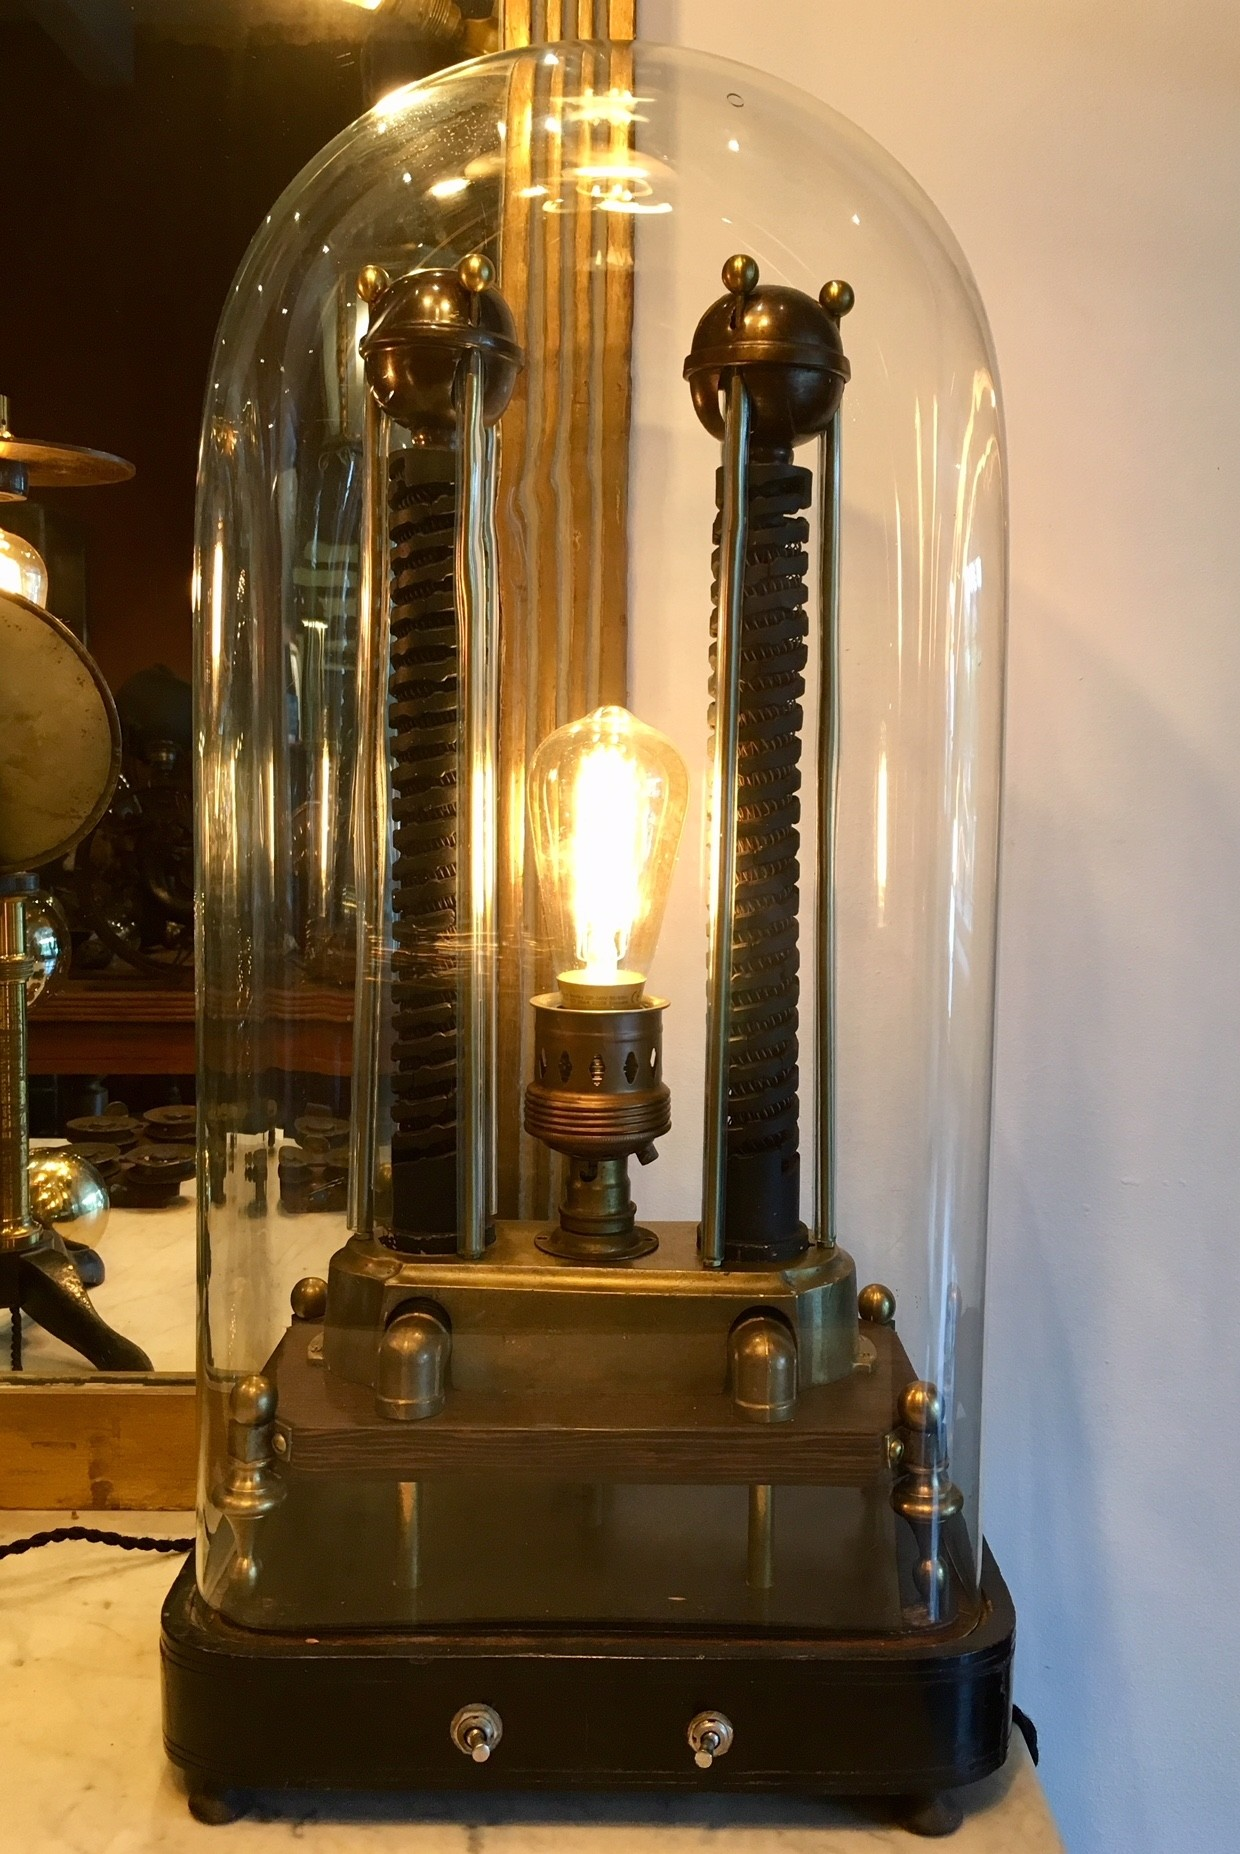 Steampunk lamp in stolp